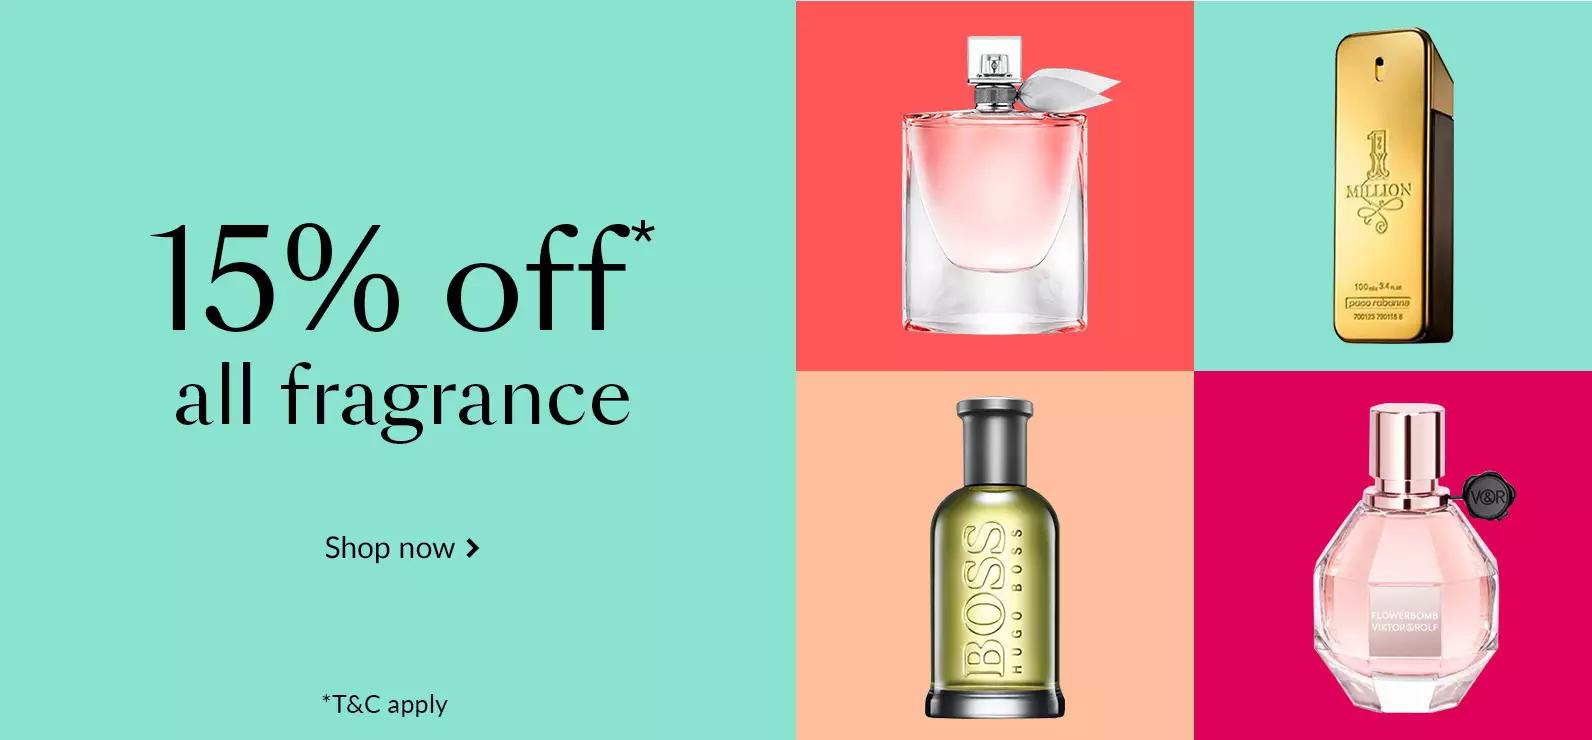 15% Off All Fragrance + Free Standard Delivery @ Debenhams